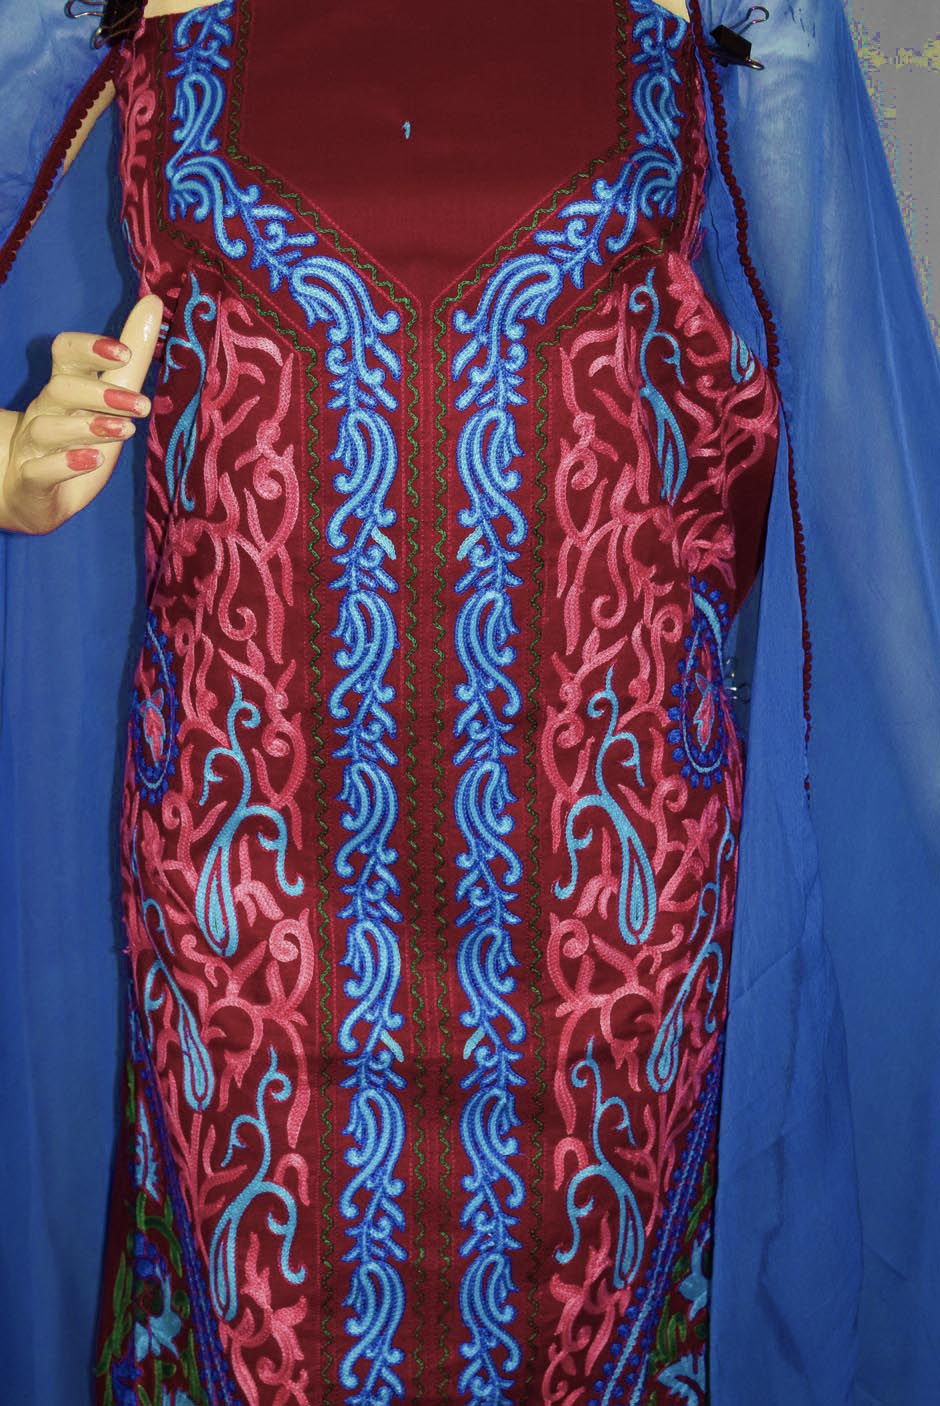 Kashmiri Embroidery Cotton Salwar Suit Fabric with matching chiffon dupatta C0640 2